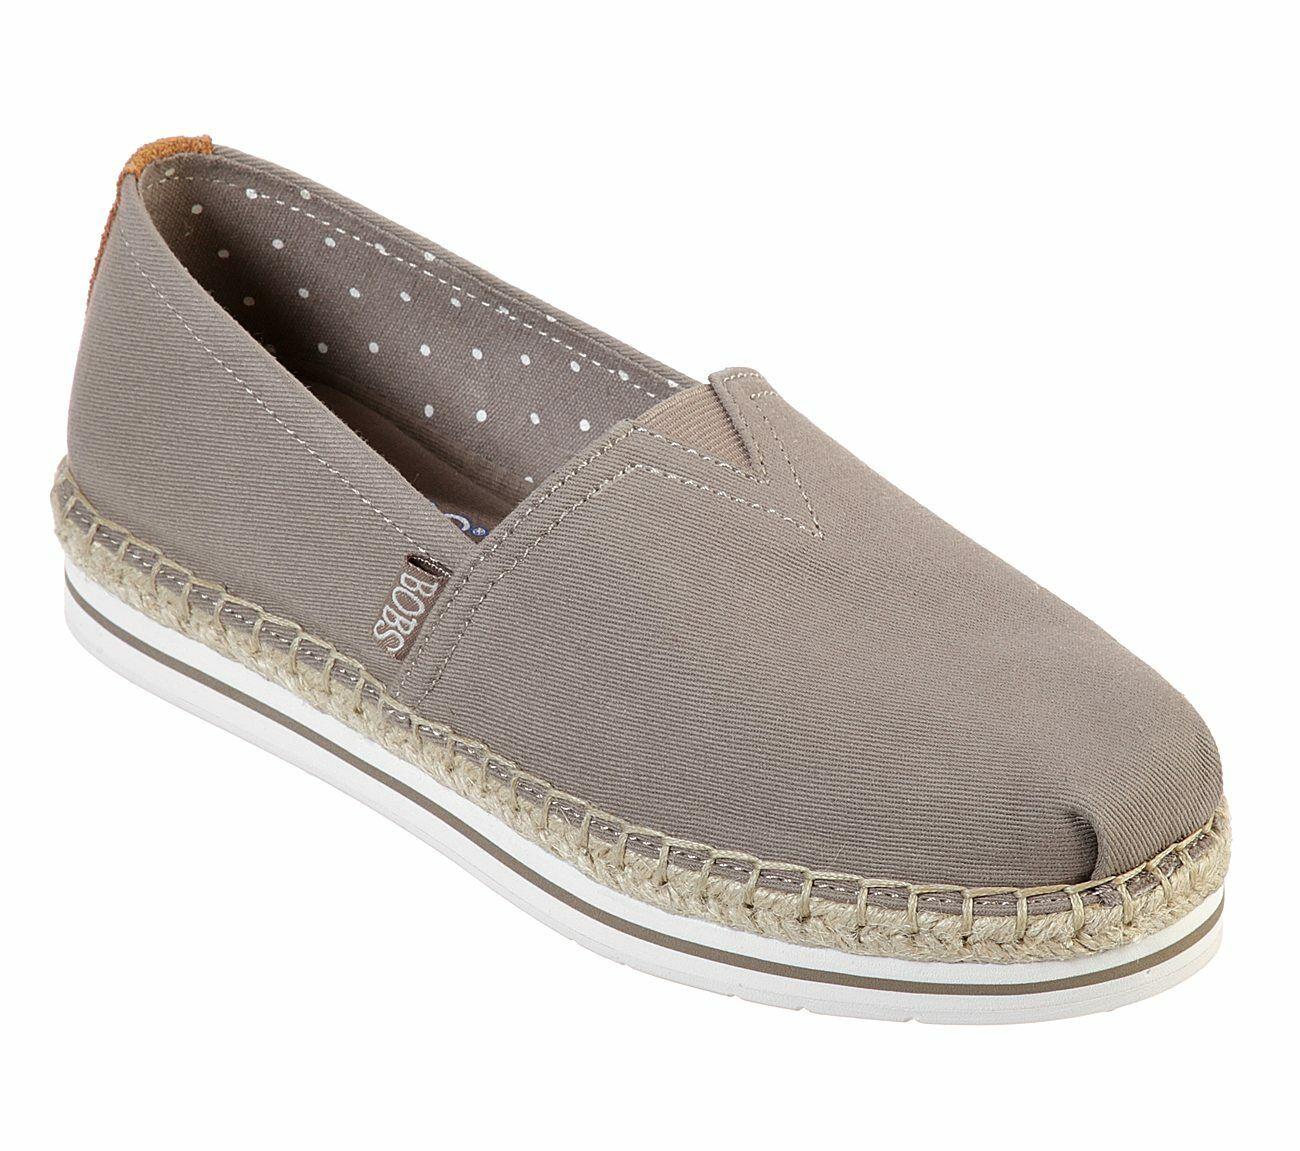 zapatos skechers 2018 new westminster gratis ecuador